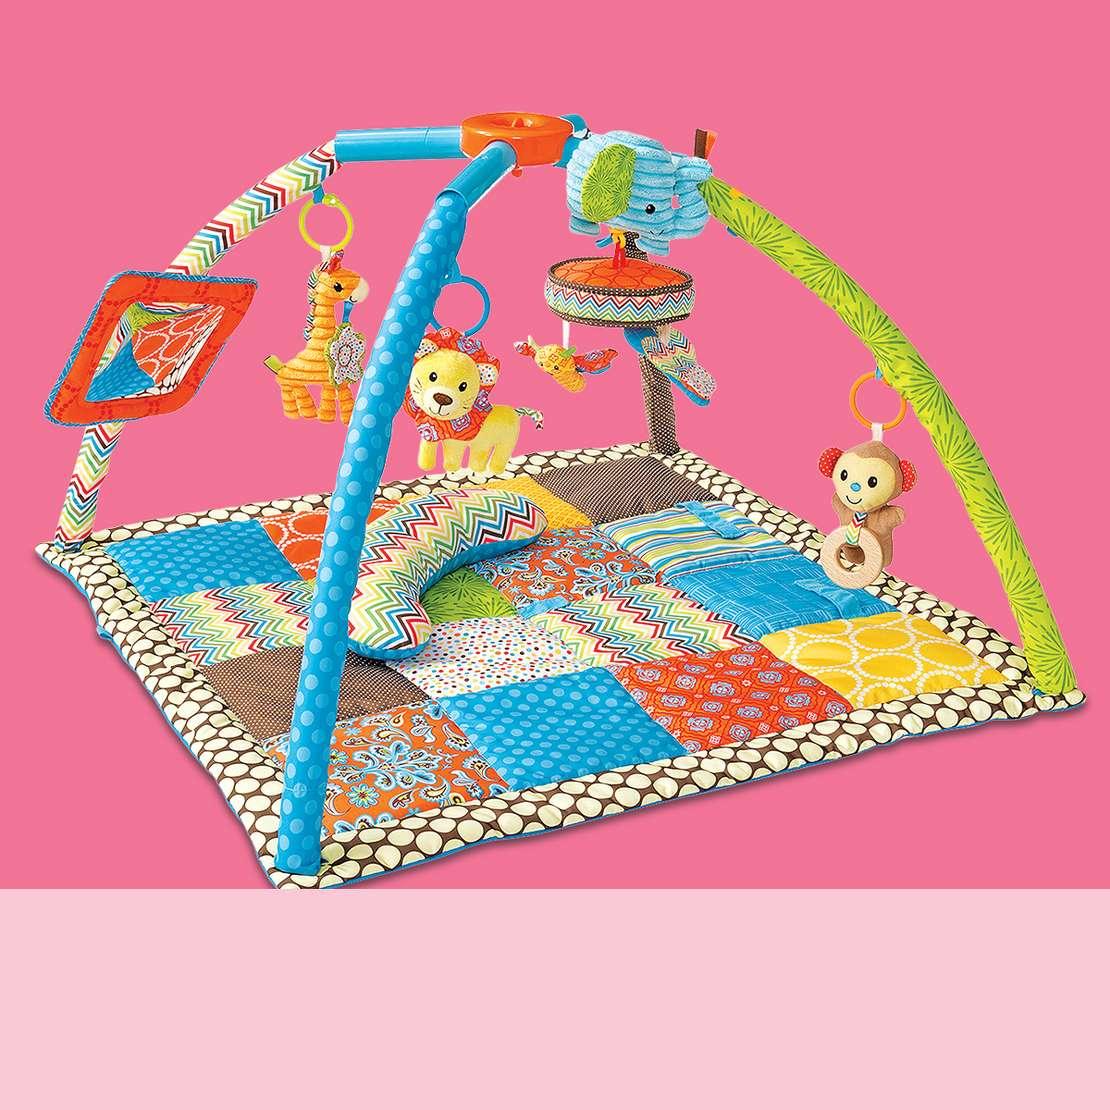 Baby Toys Target